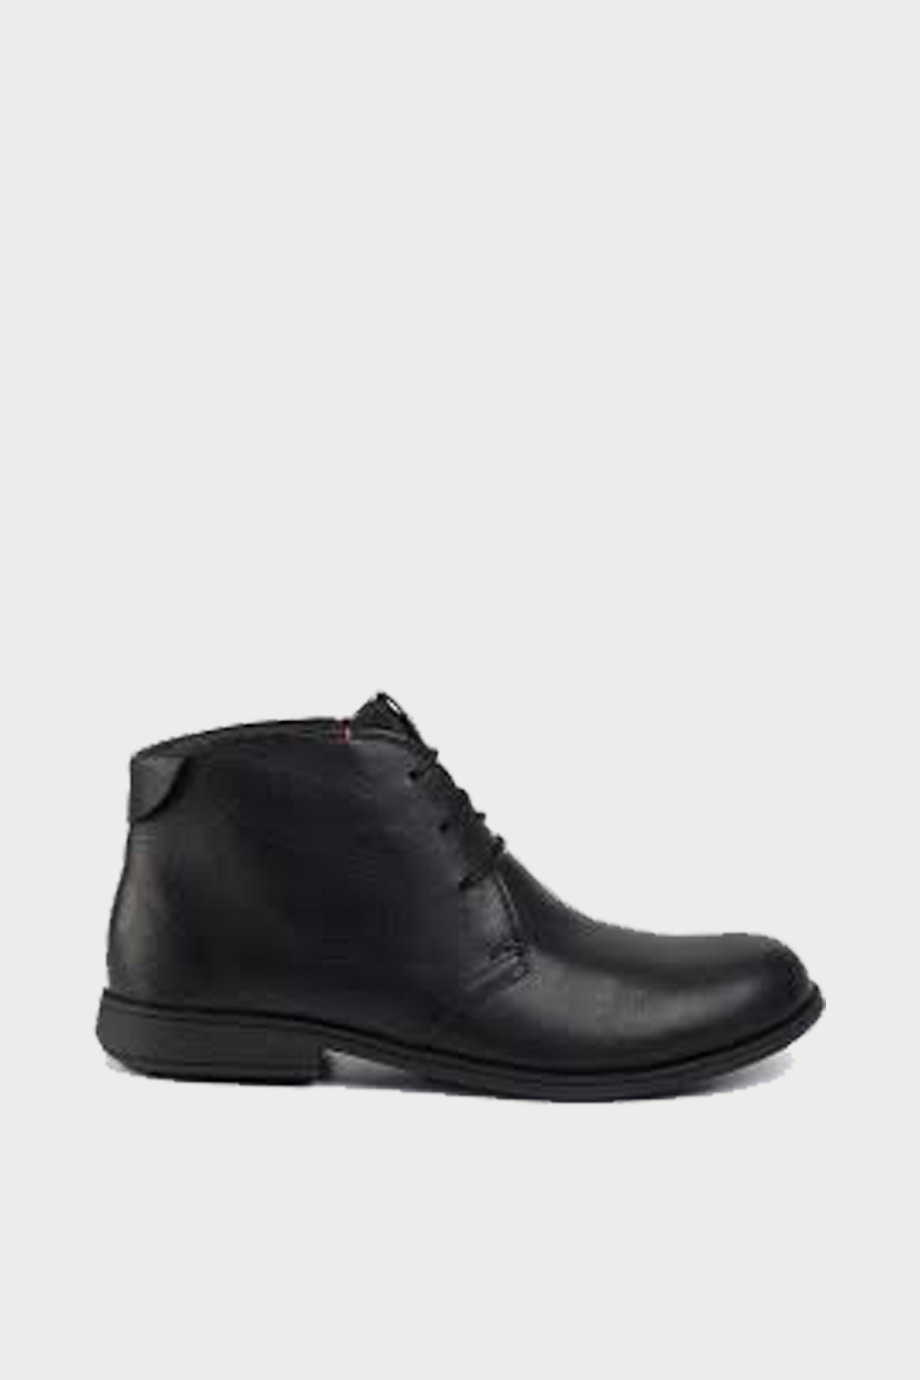 spiridoula metheniti shoes xalkida p Camper 36587 022 1913 1